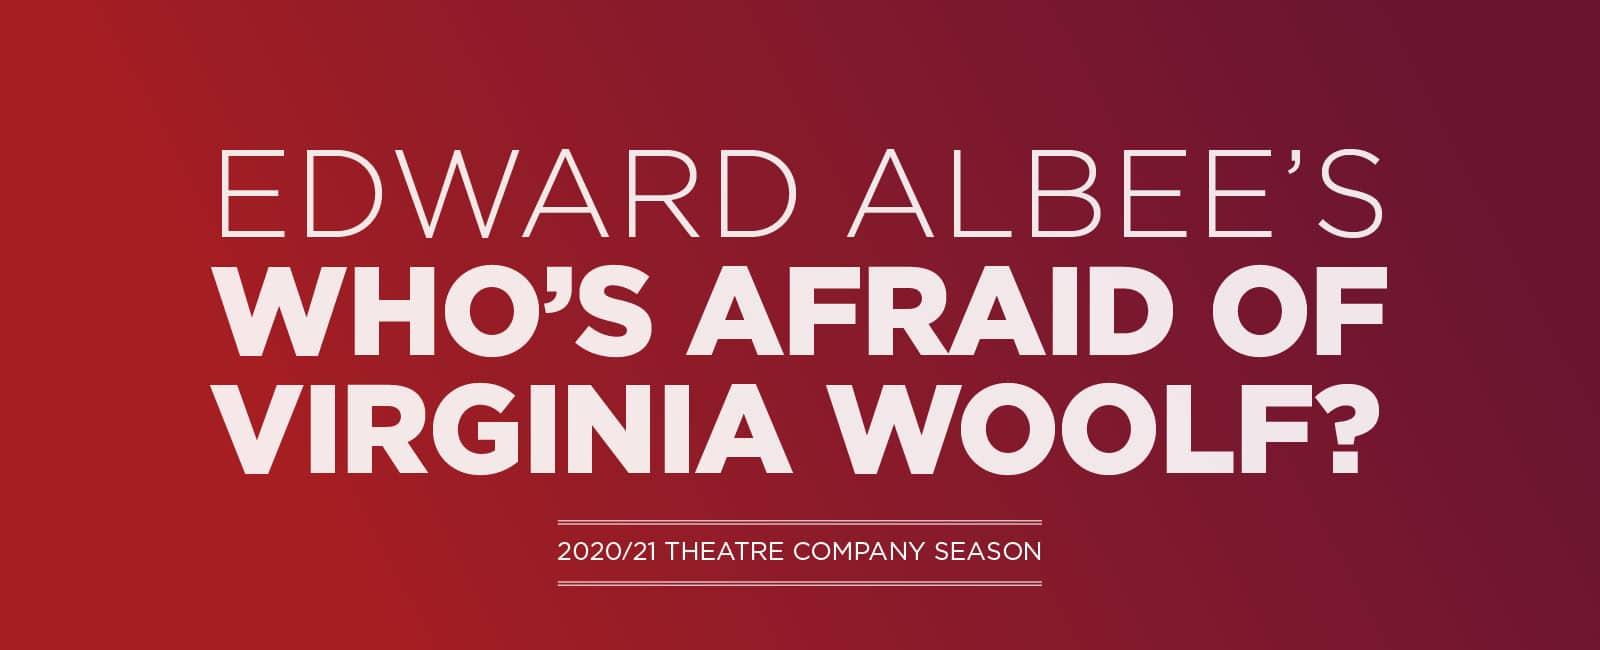 Edward Albee's Who's Afraid of Virginia Woolf?